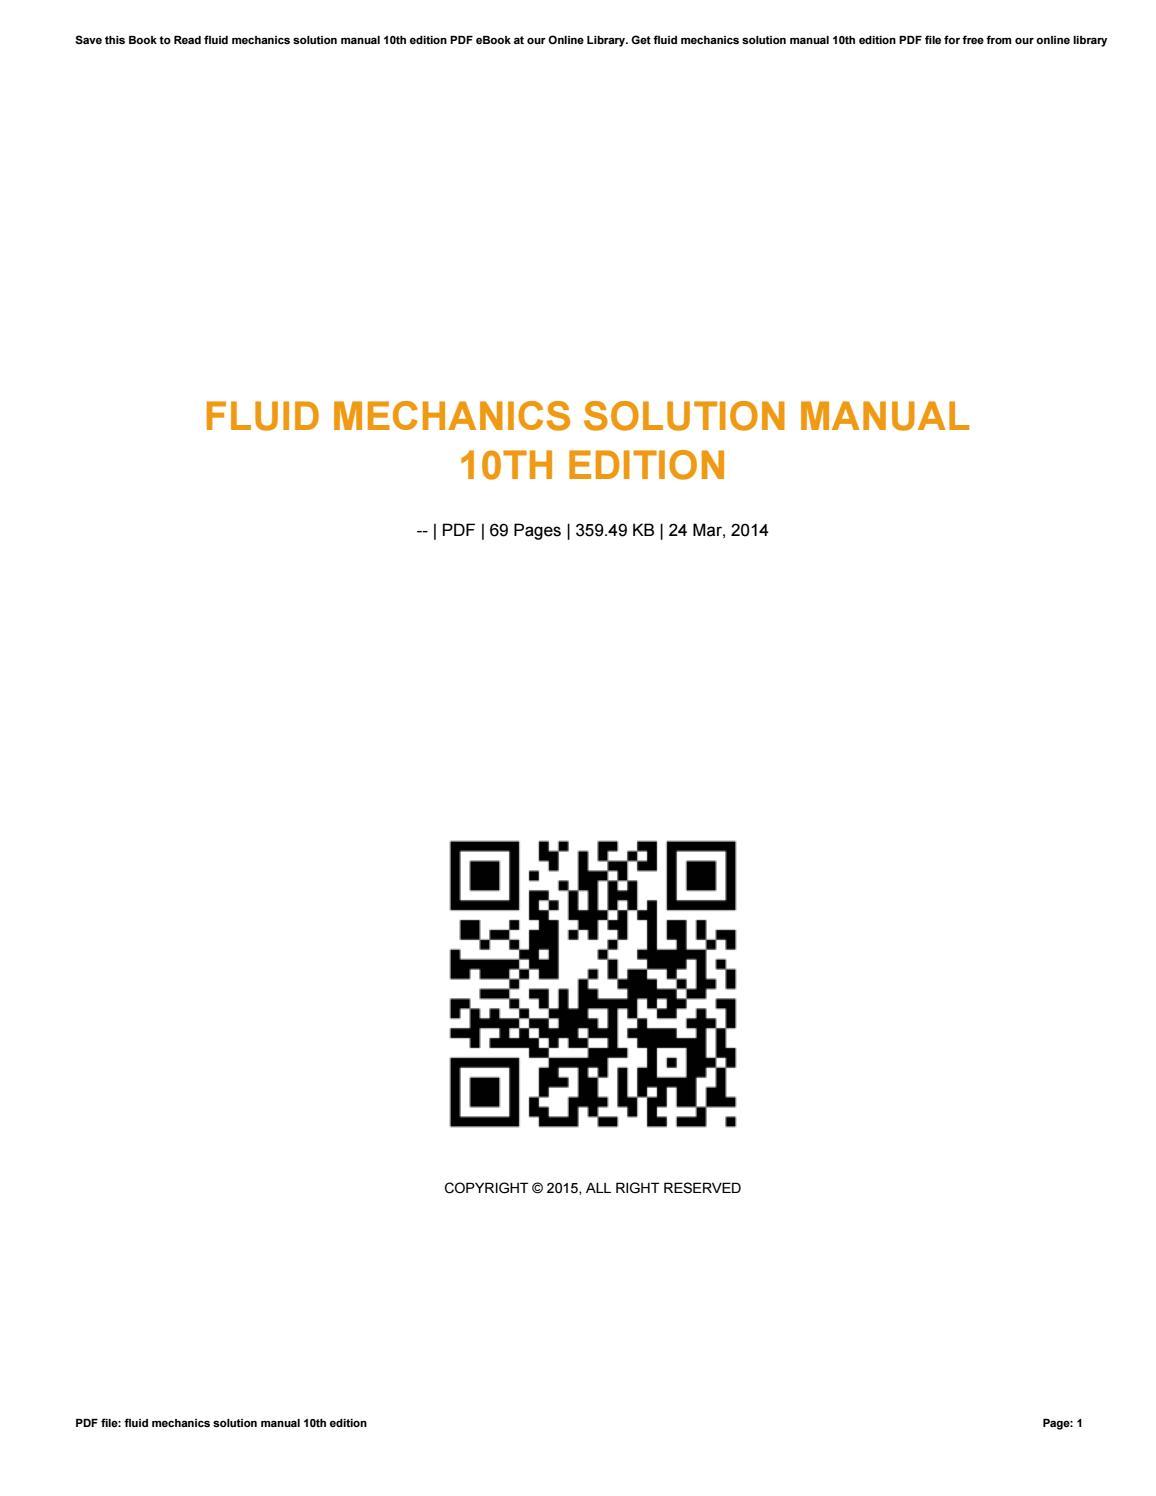 Fluid mechanics solution manual 10th edition by asdhgsad0